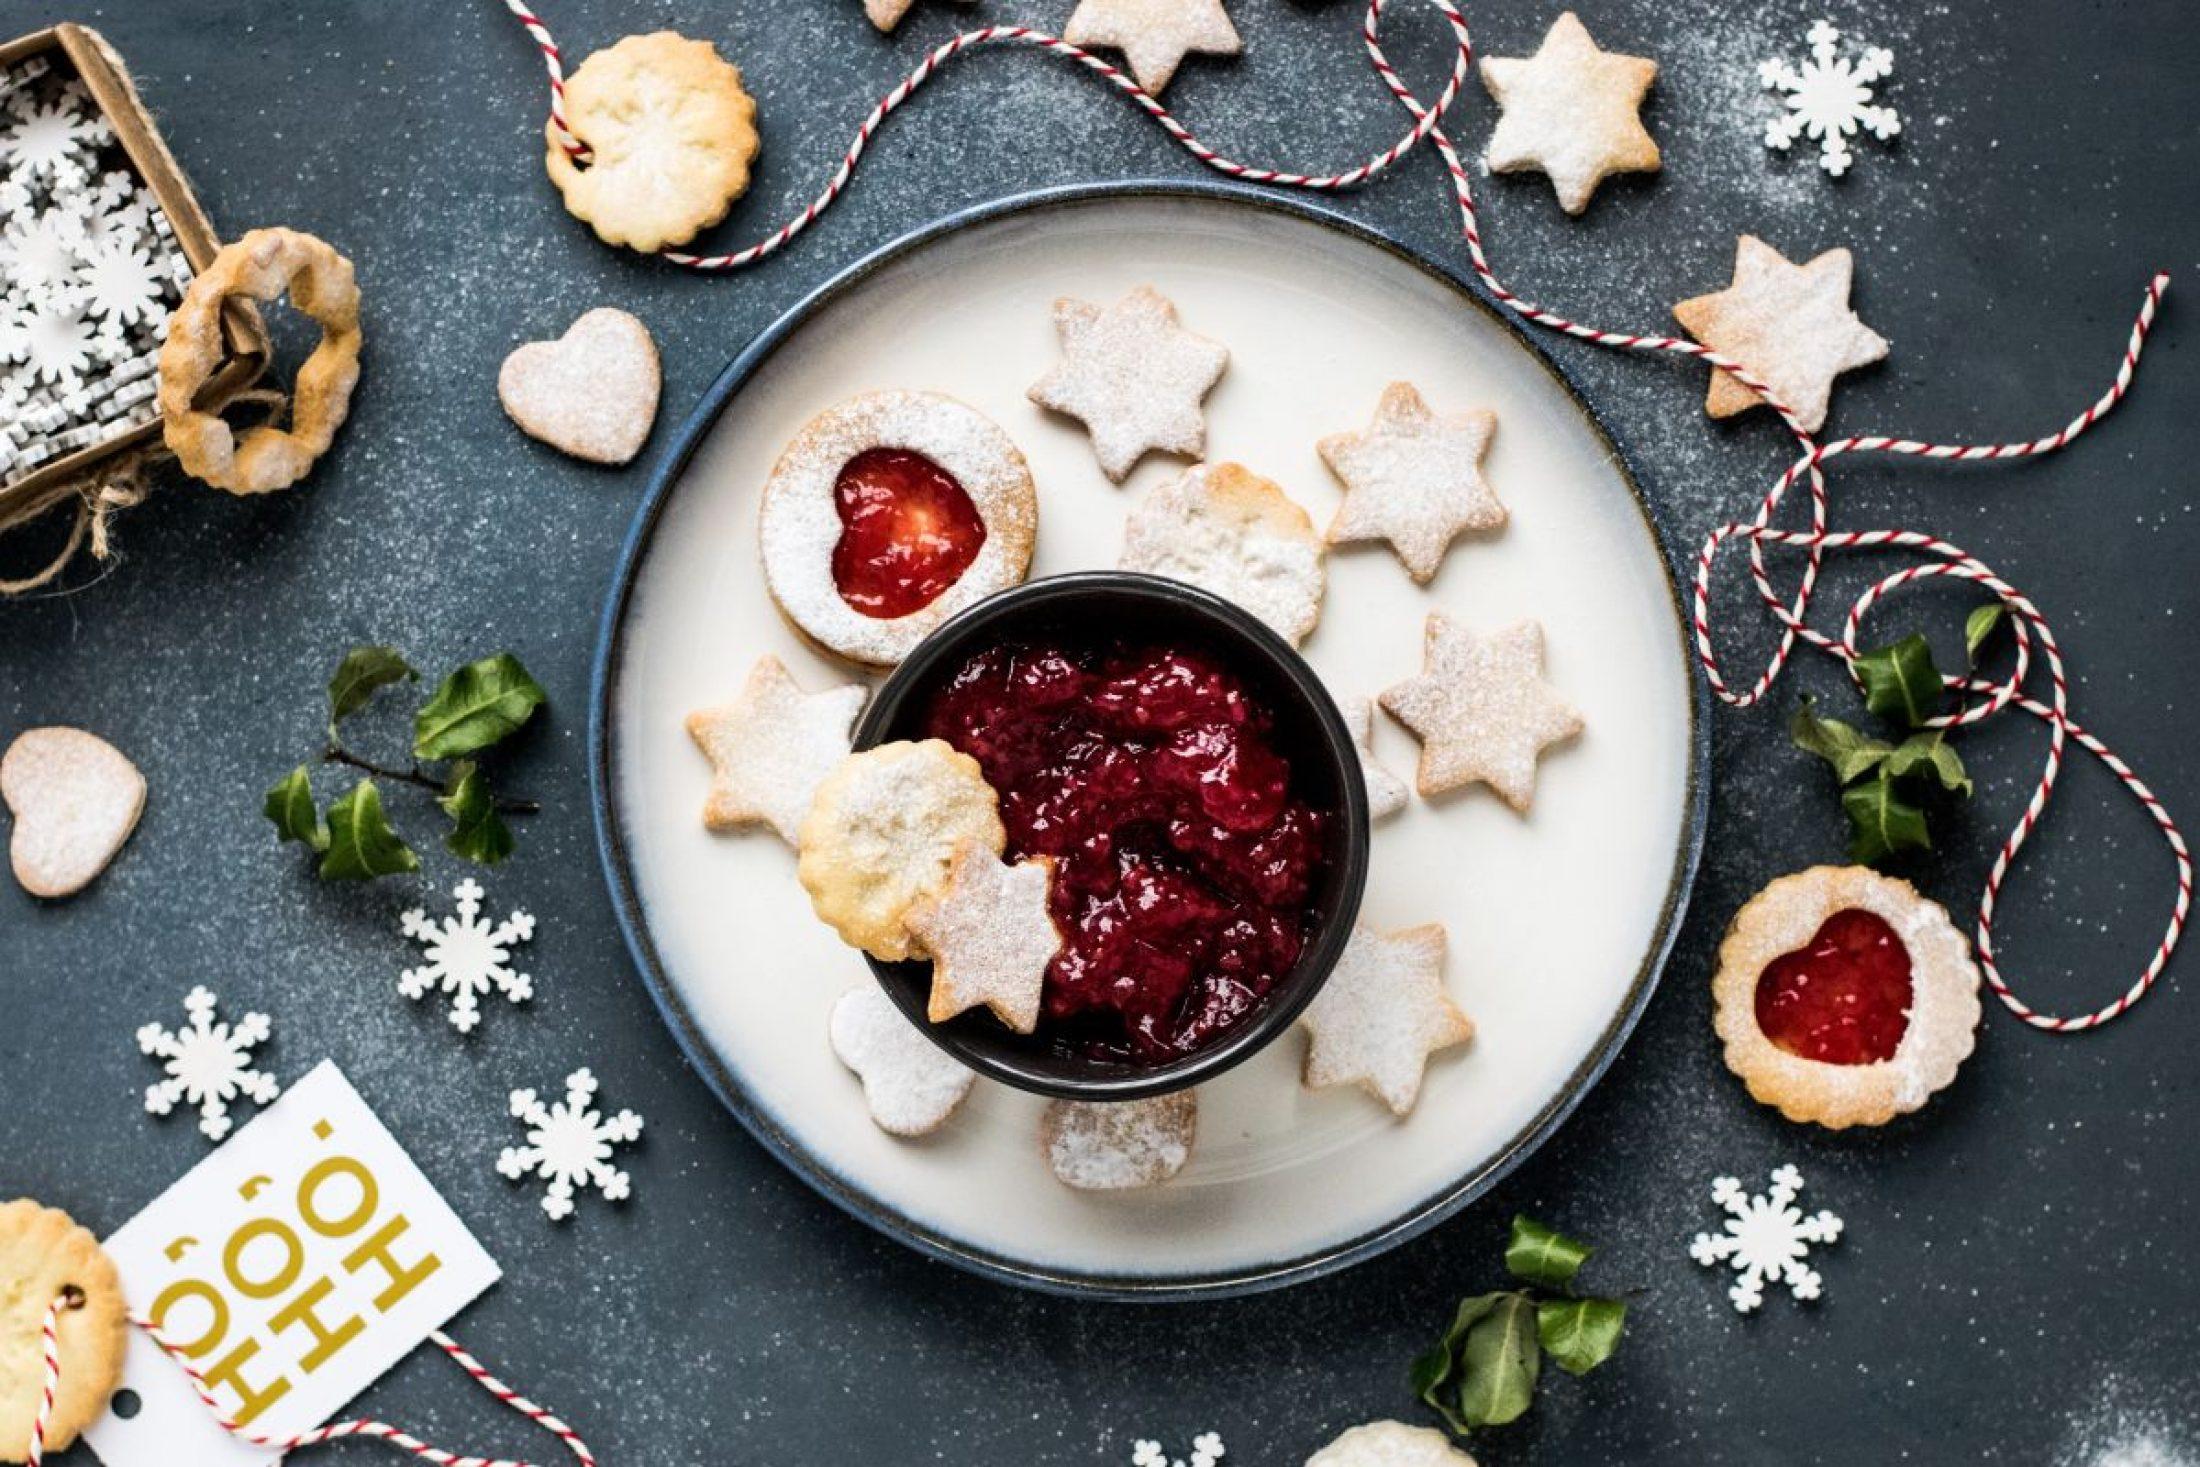 Sustainable Christmas ideas